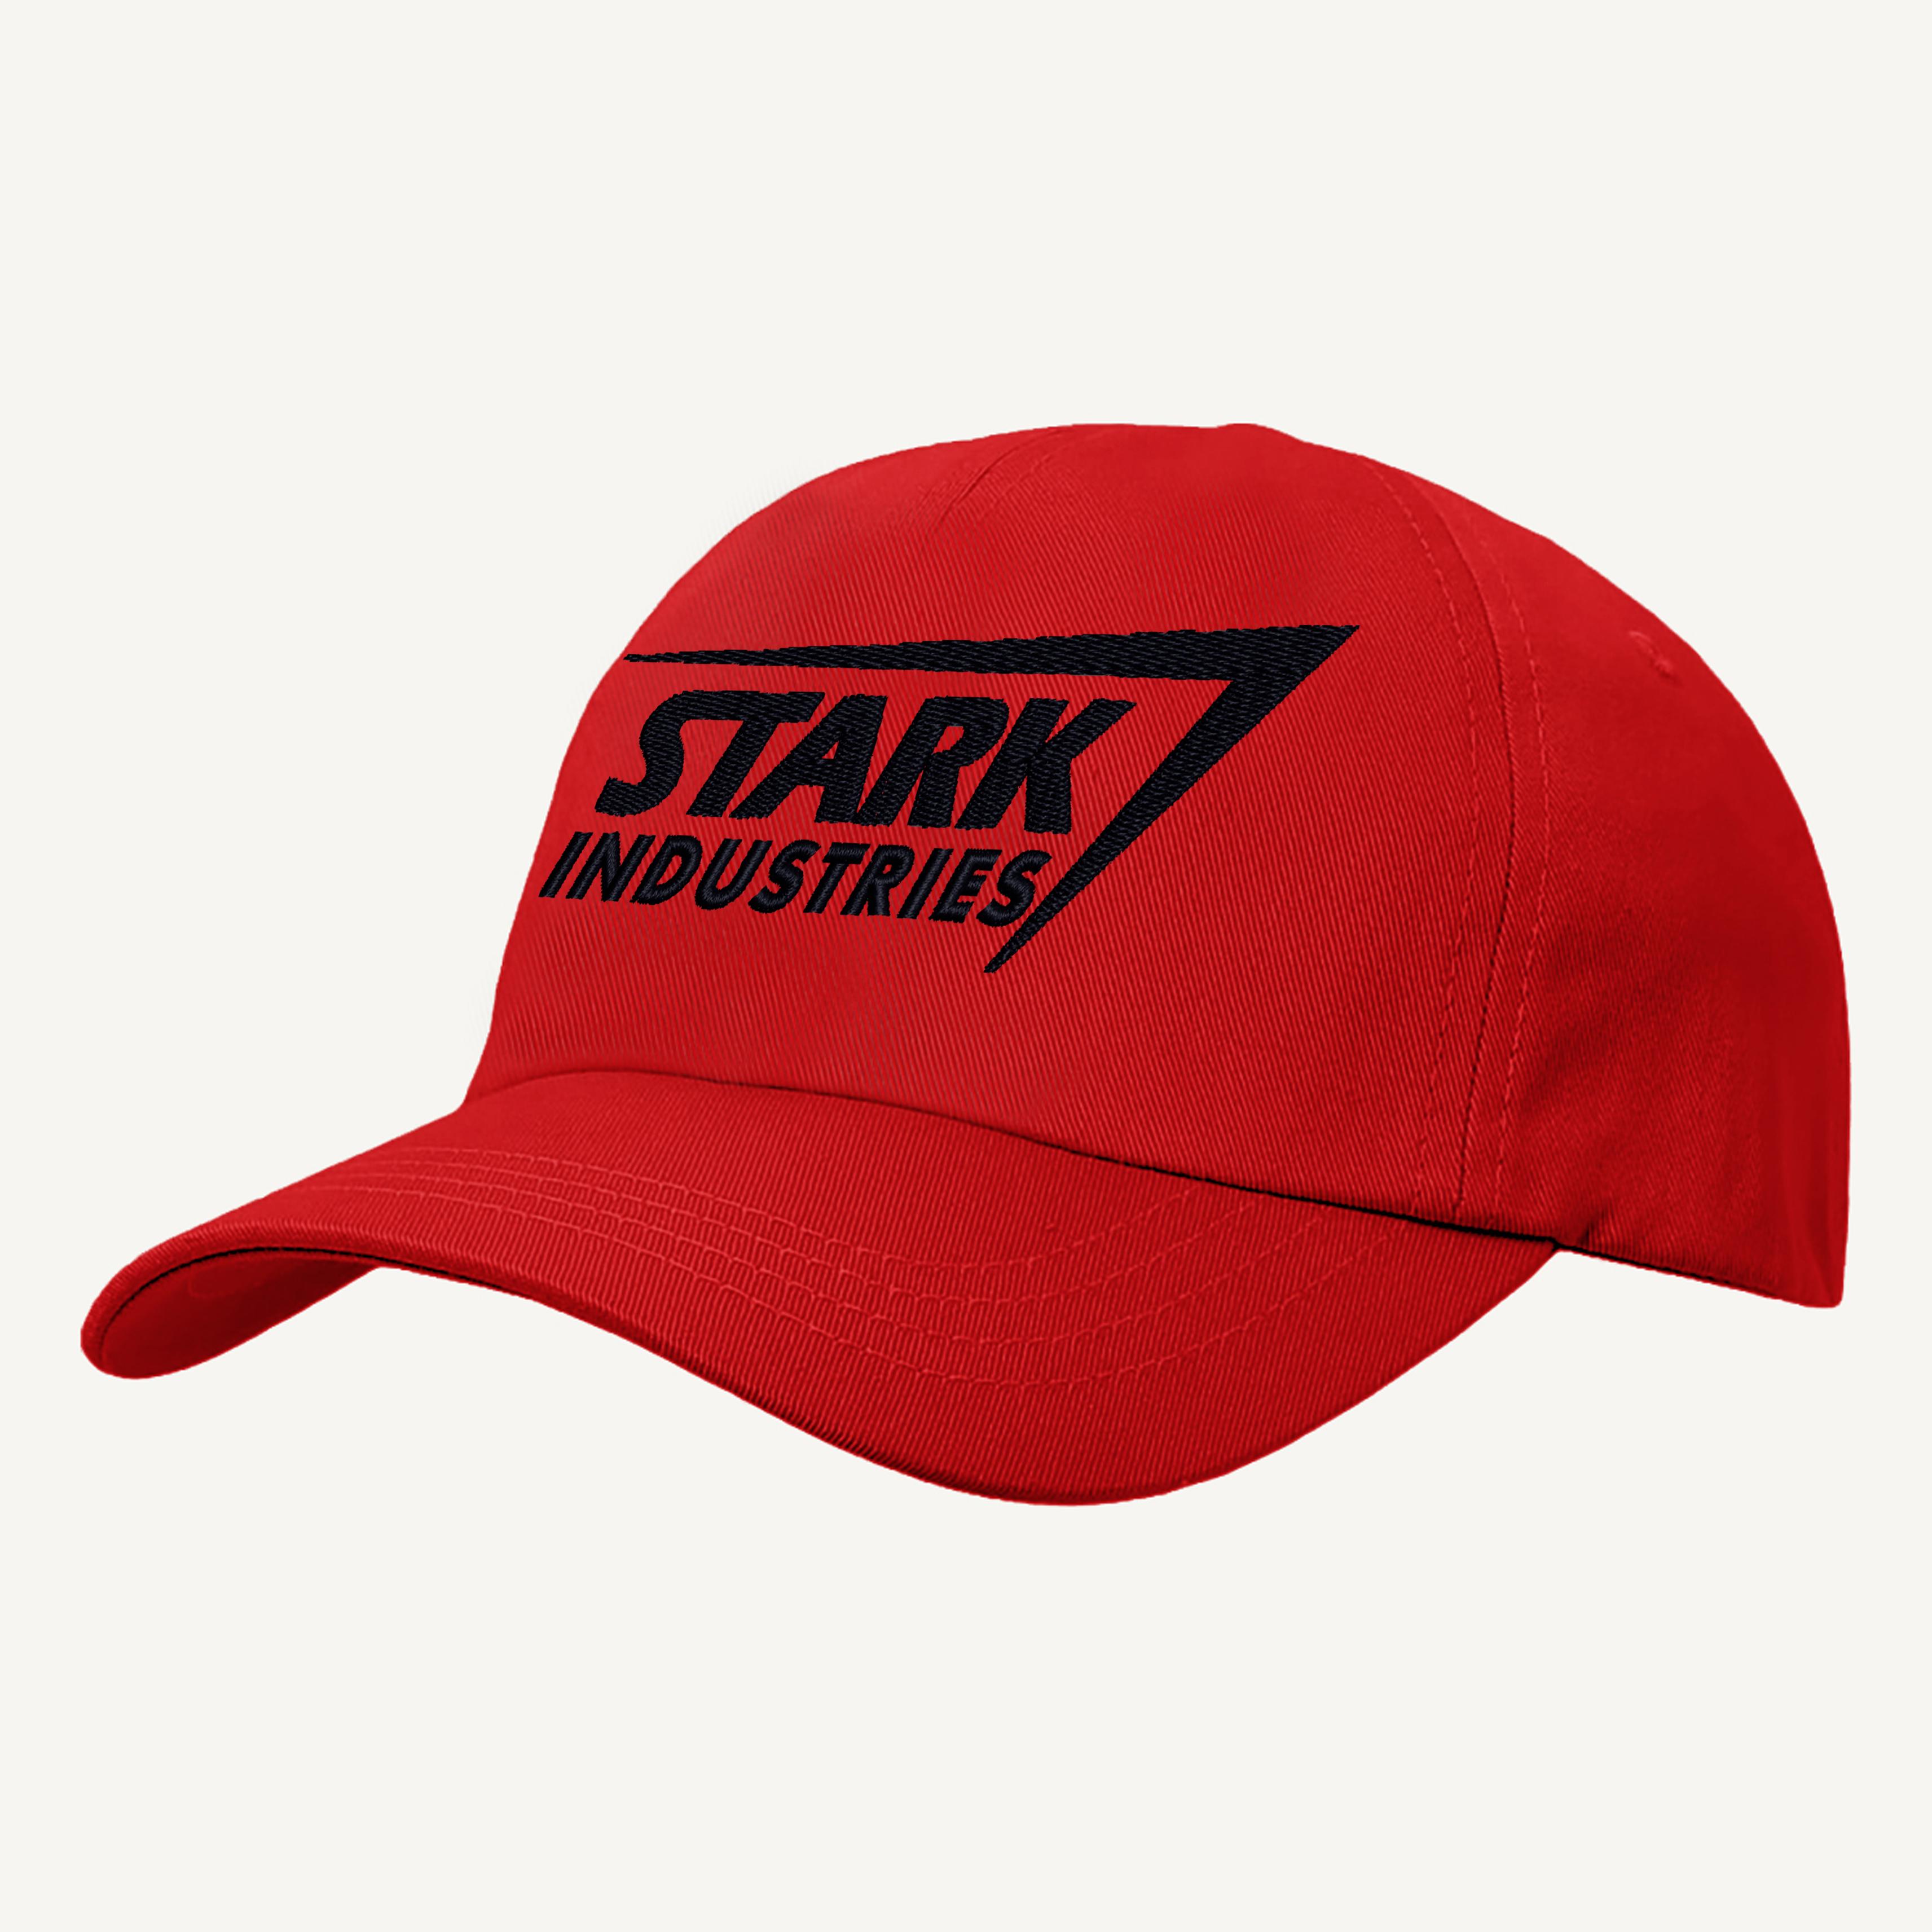 iron man baseball cap stark industries text hat embroidered design